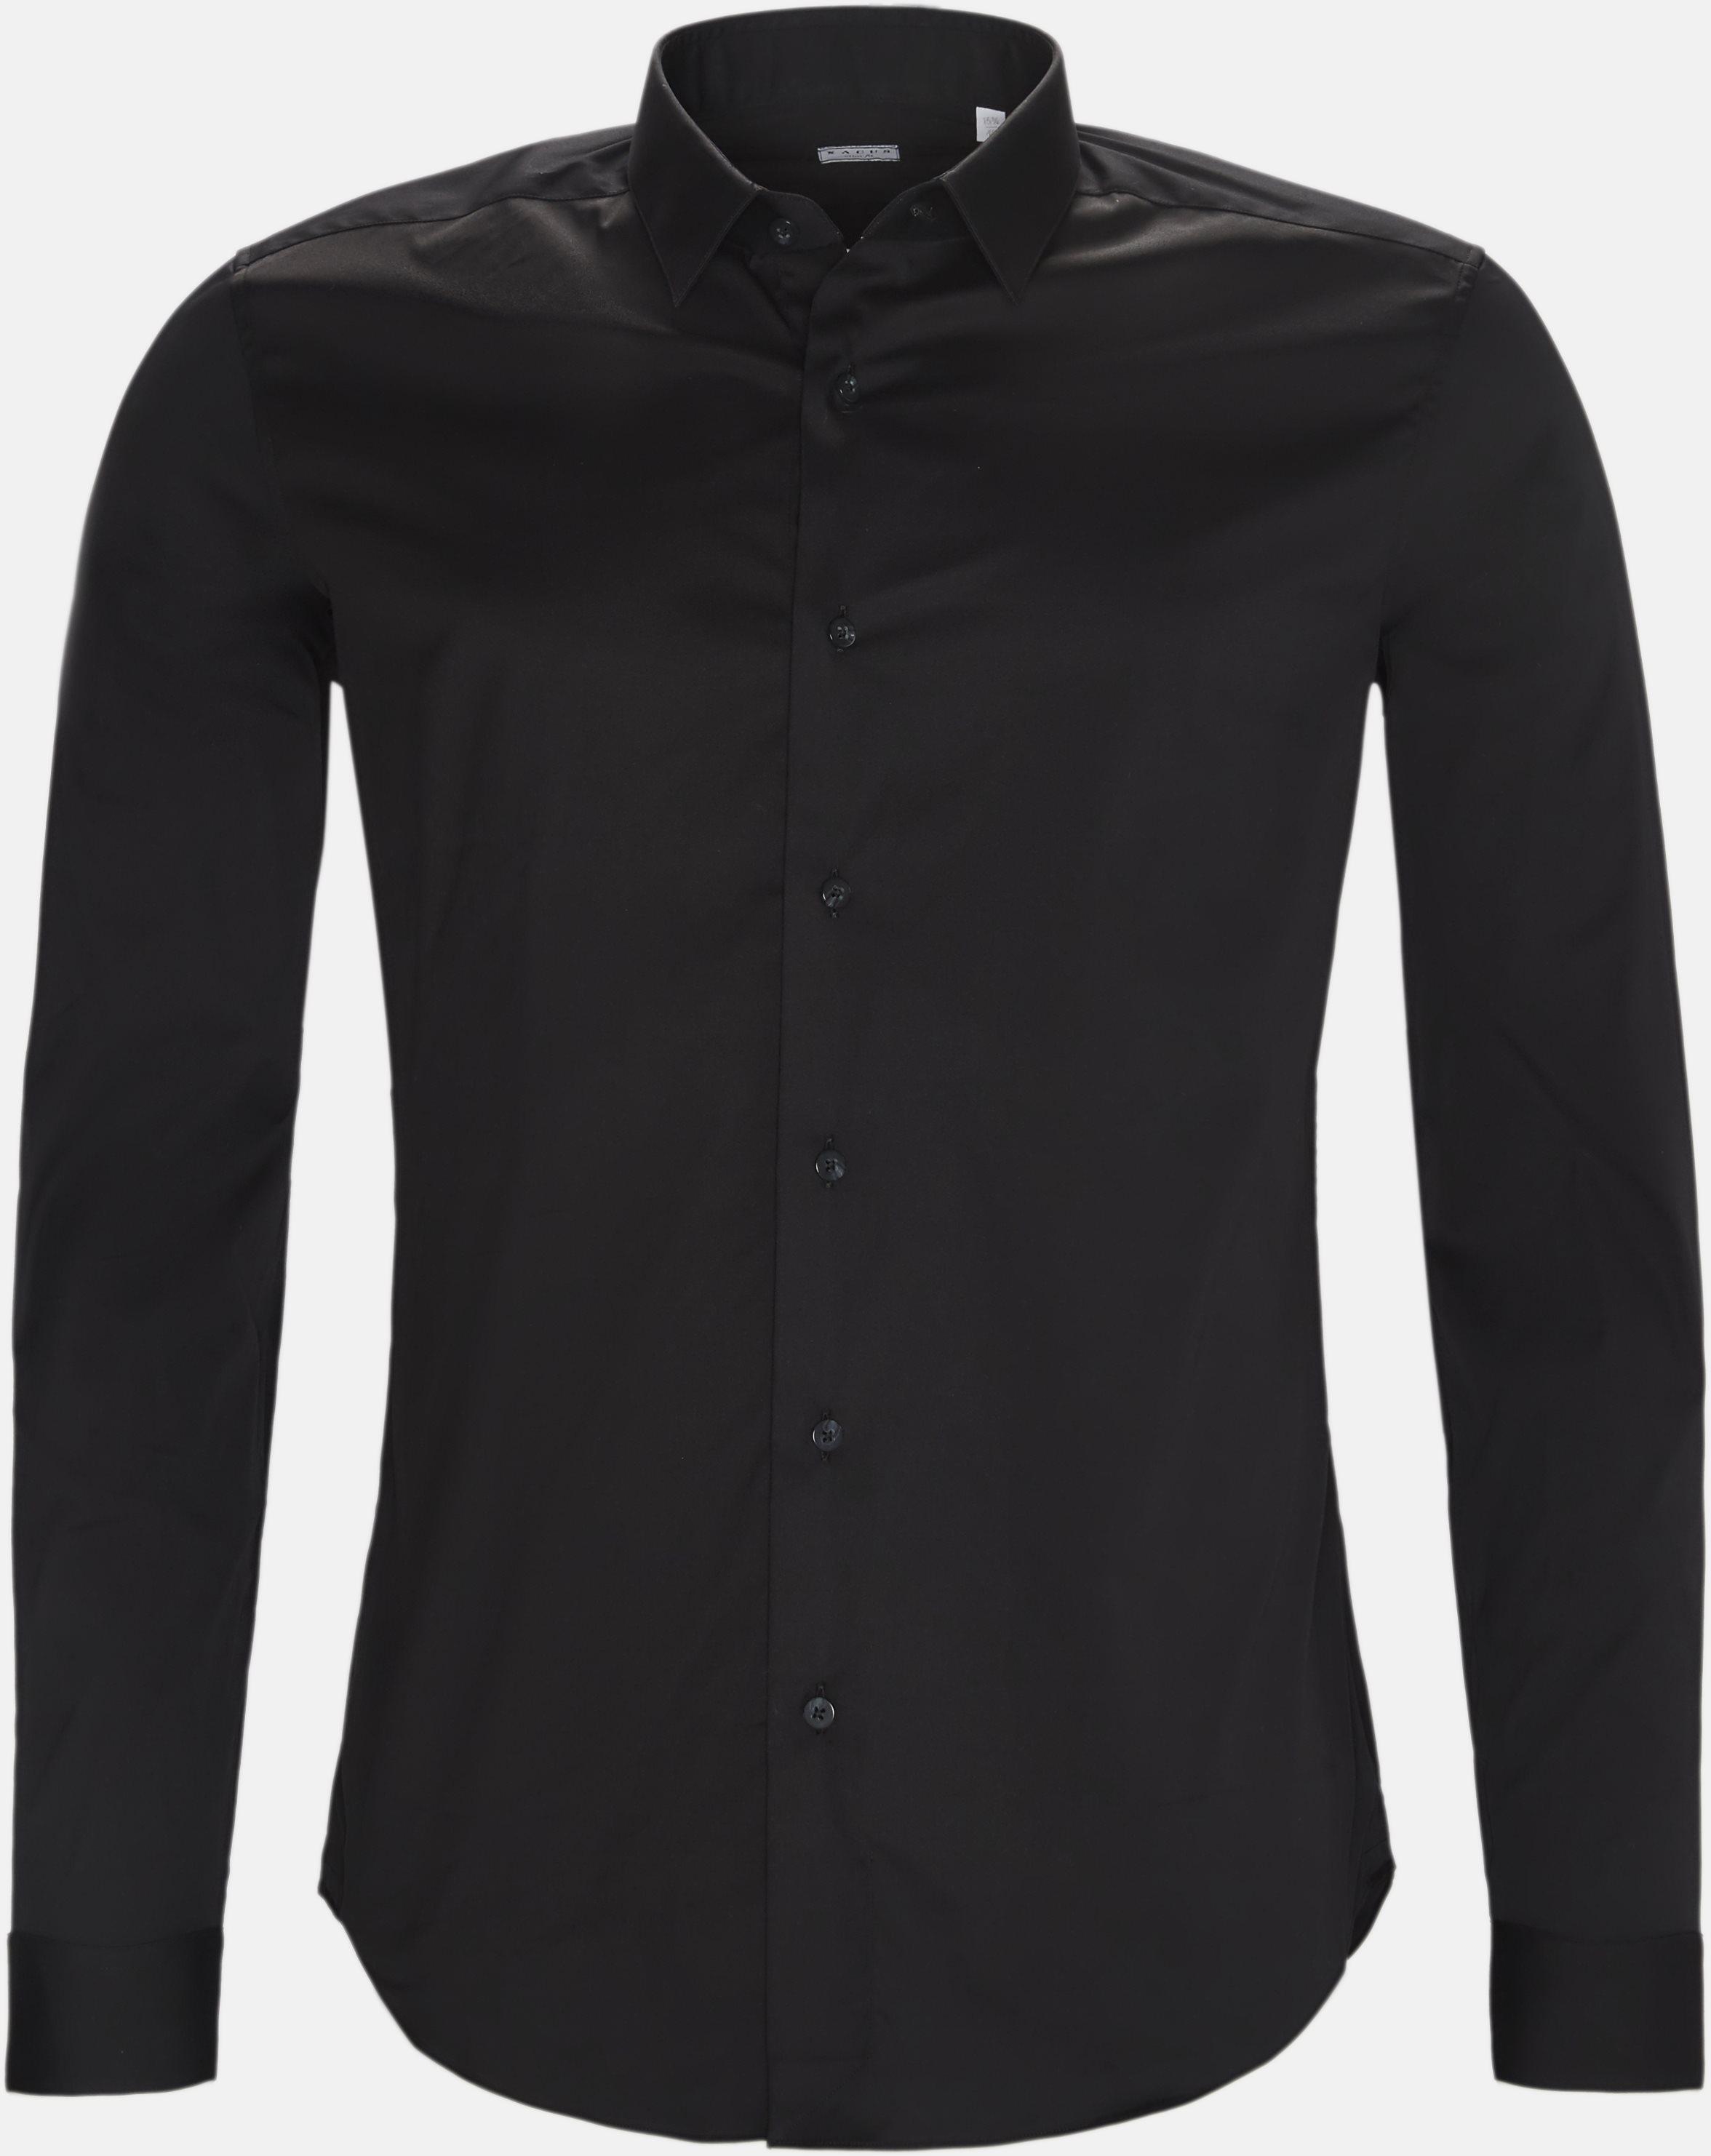 16125 661ML NY skjorte - Skjorter - Sort